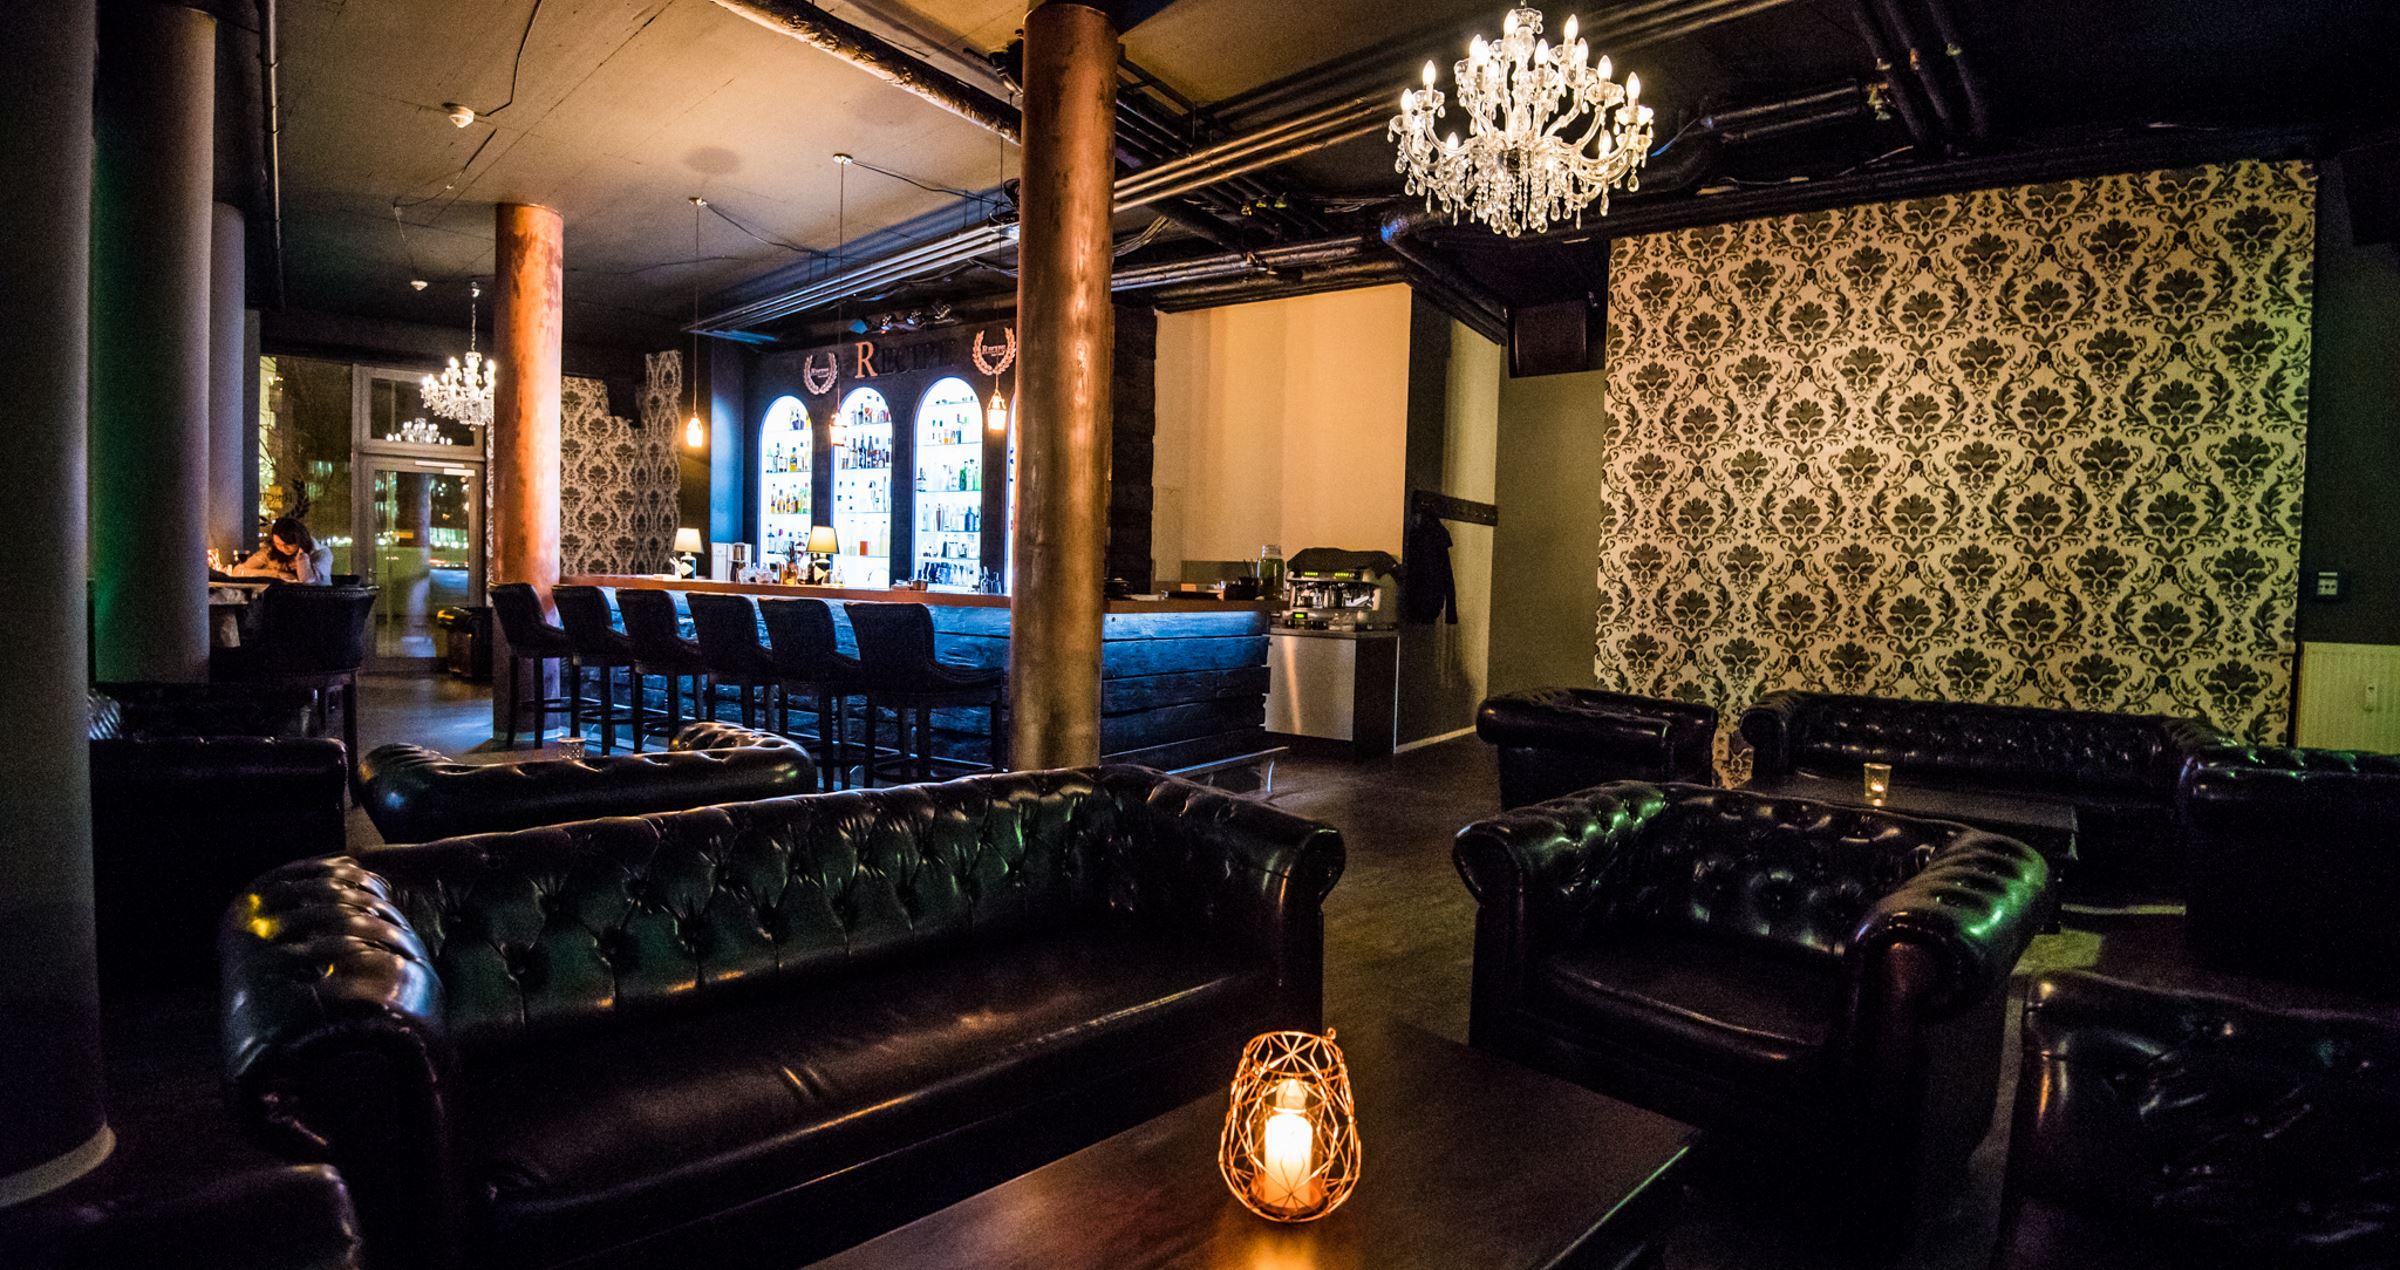 Recipe Bar & Eventlocation in Frankfurt - Der Eventplaner